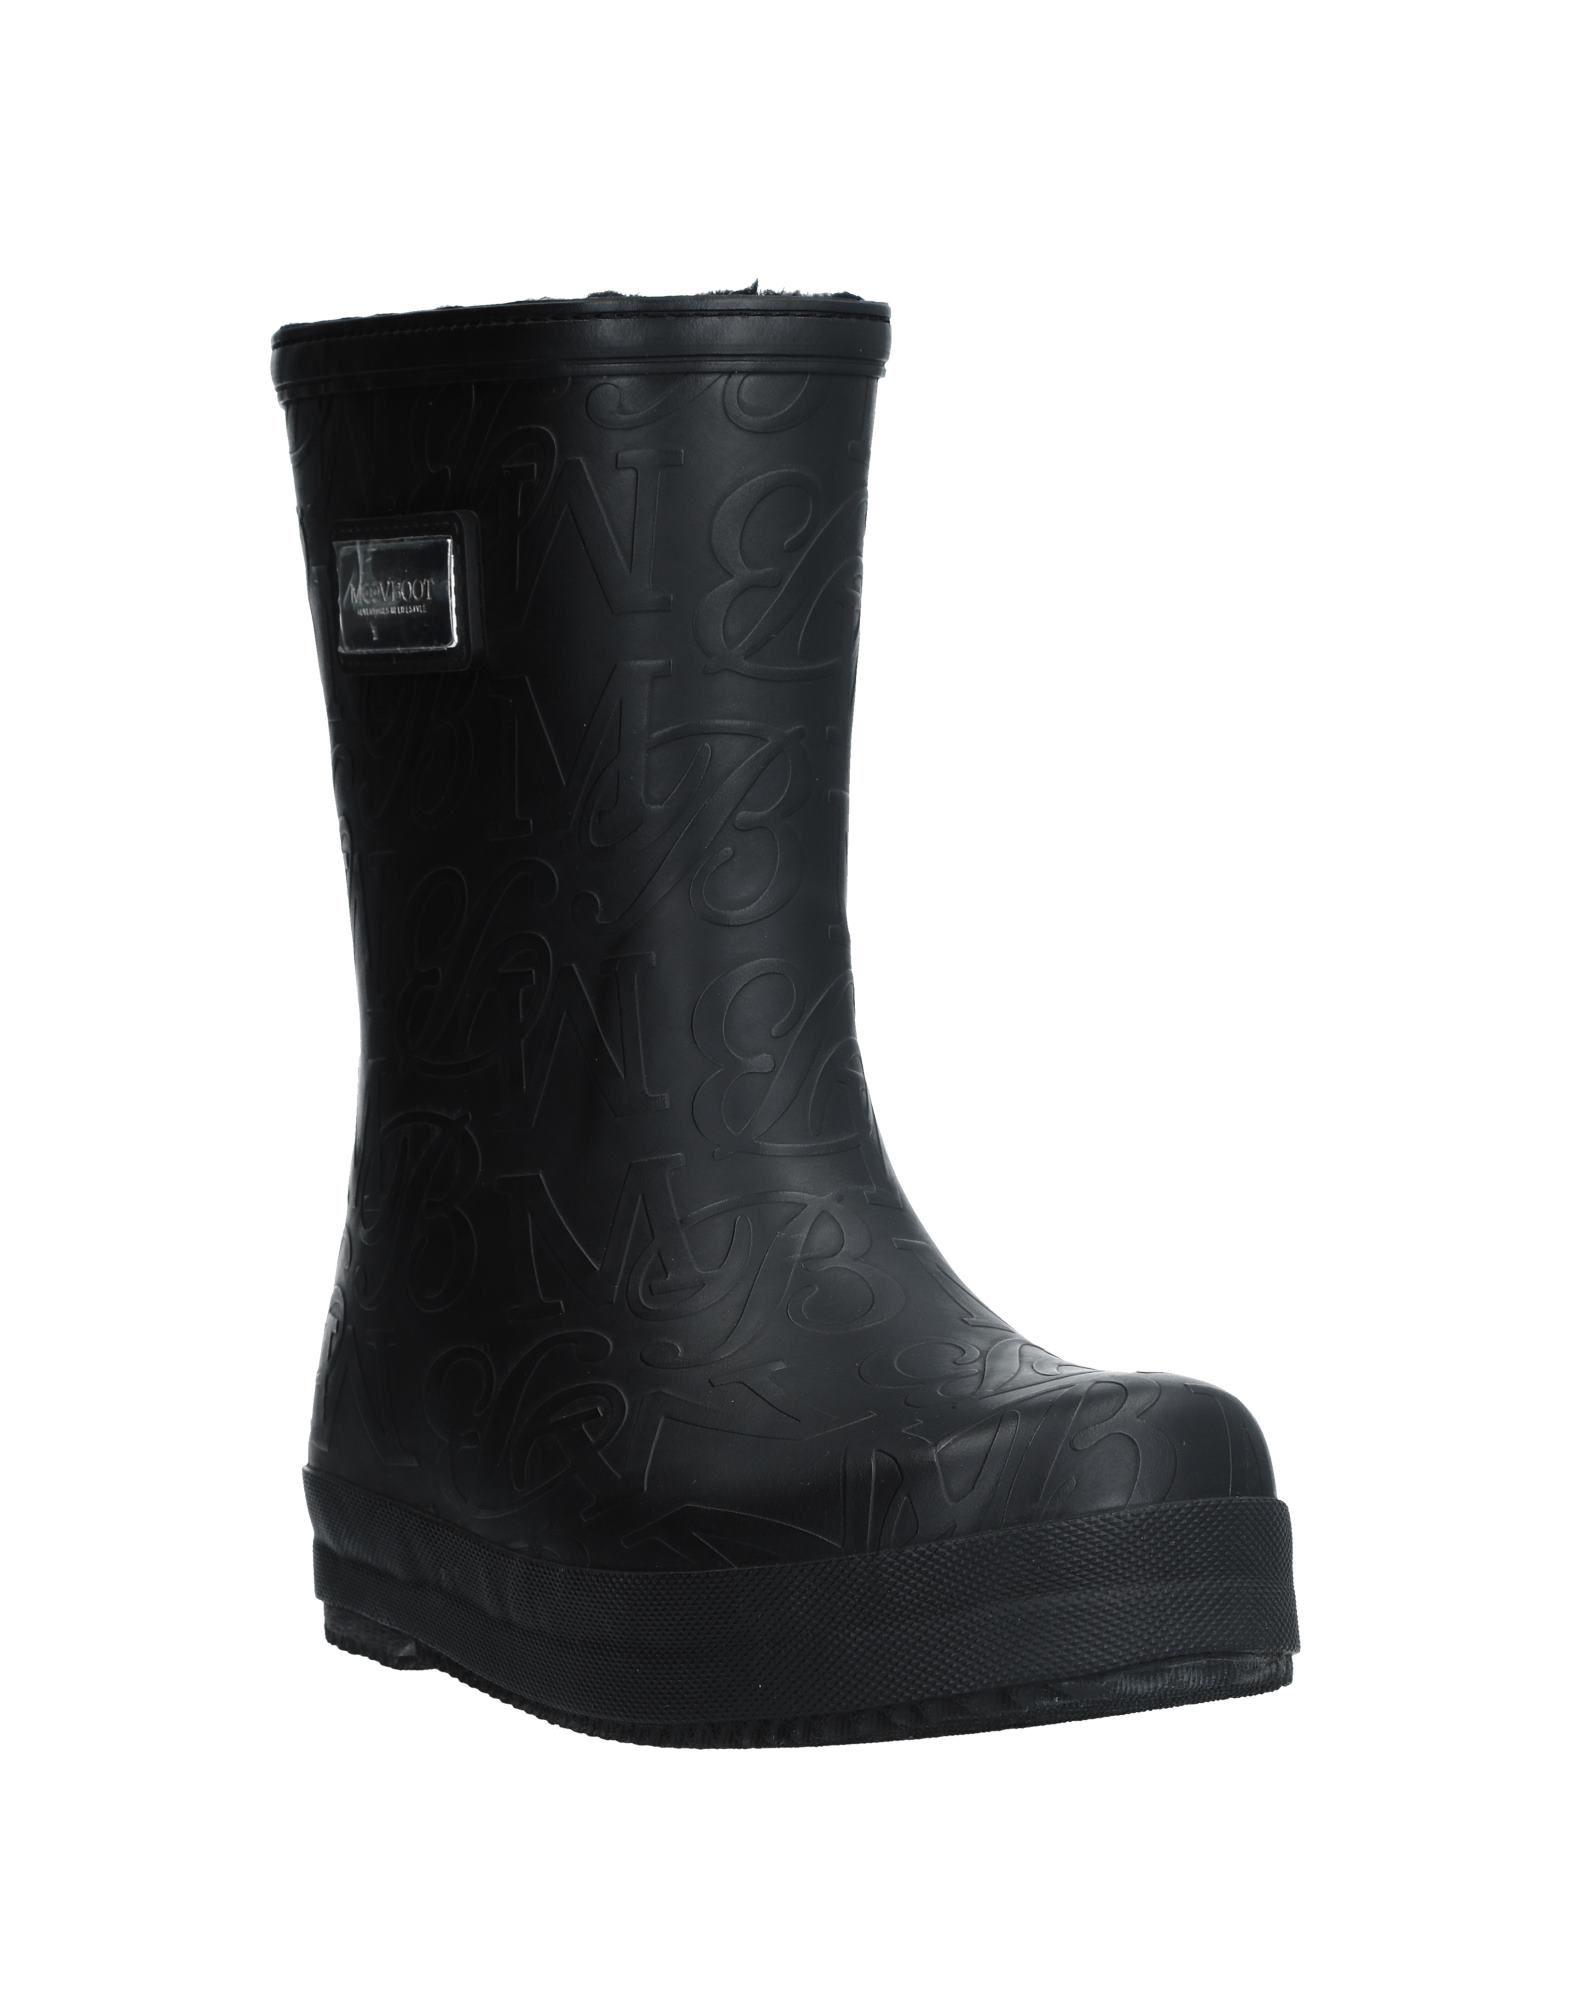 Stilvolle billige  Schuhe Moovboot Stiefelette Damen  billige 11536812IU a40555